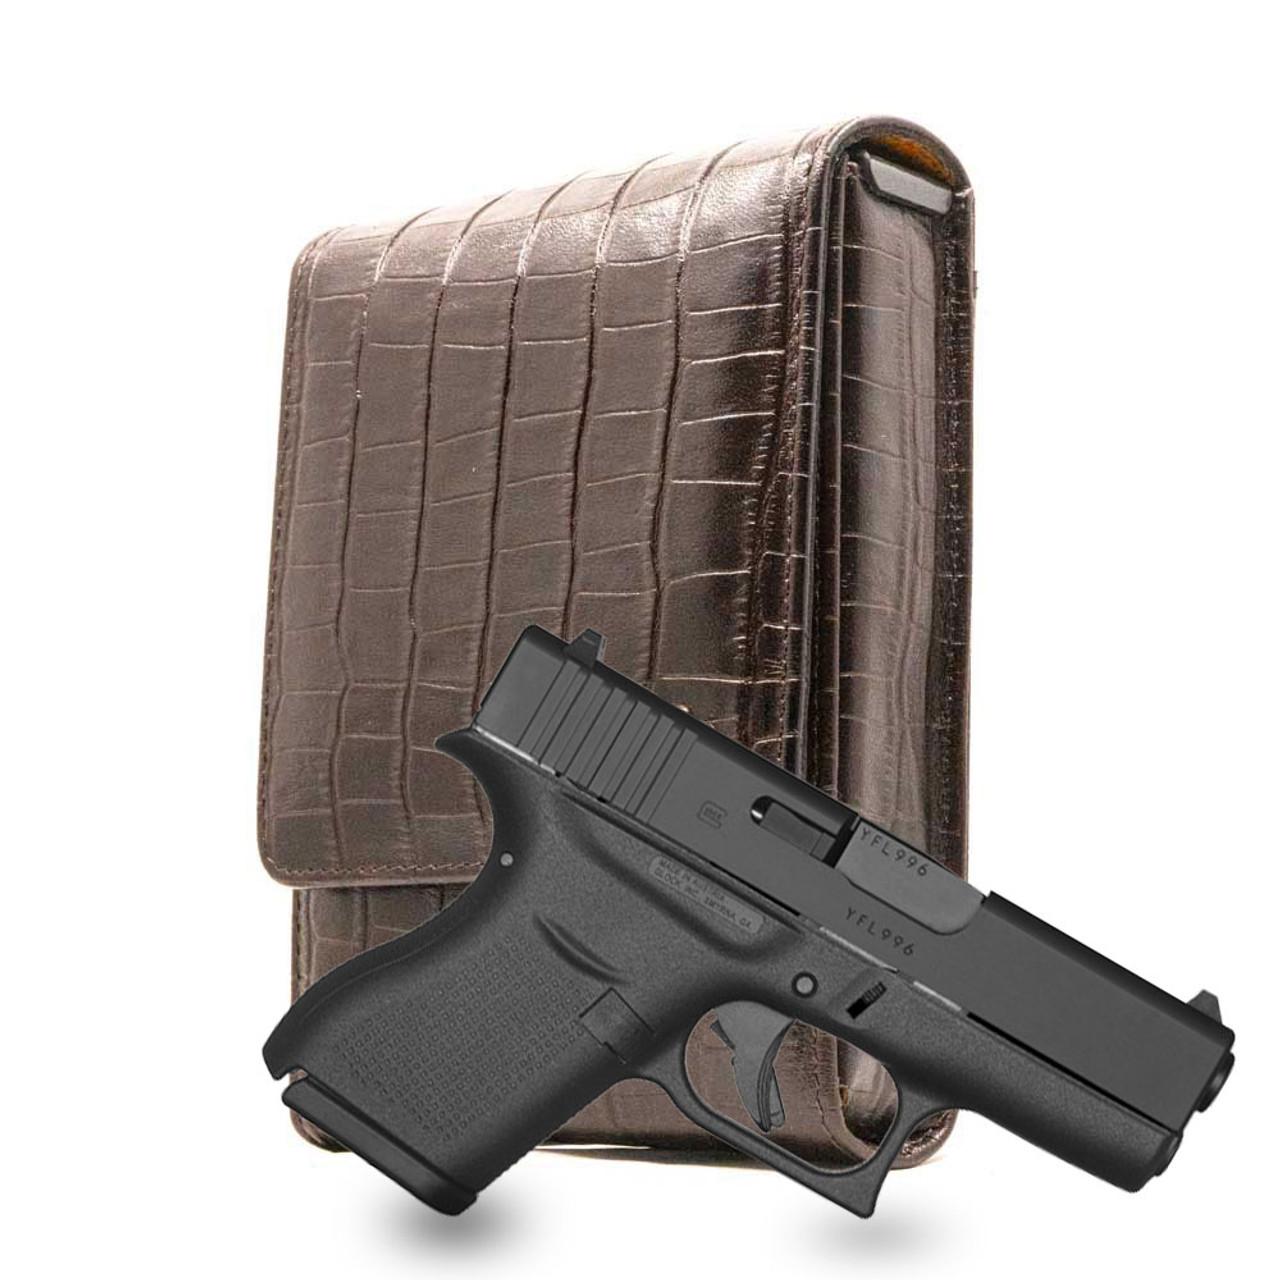 Glock 43 Brown Alligator Series Holster